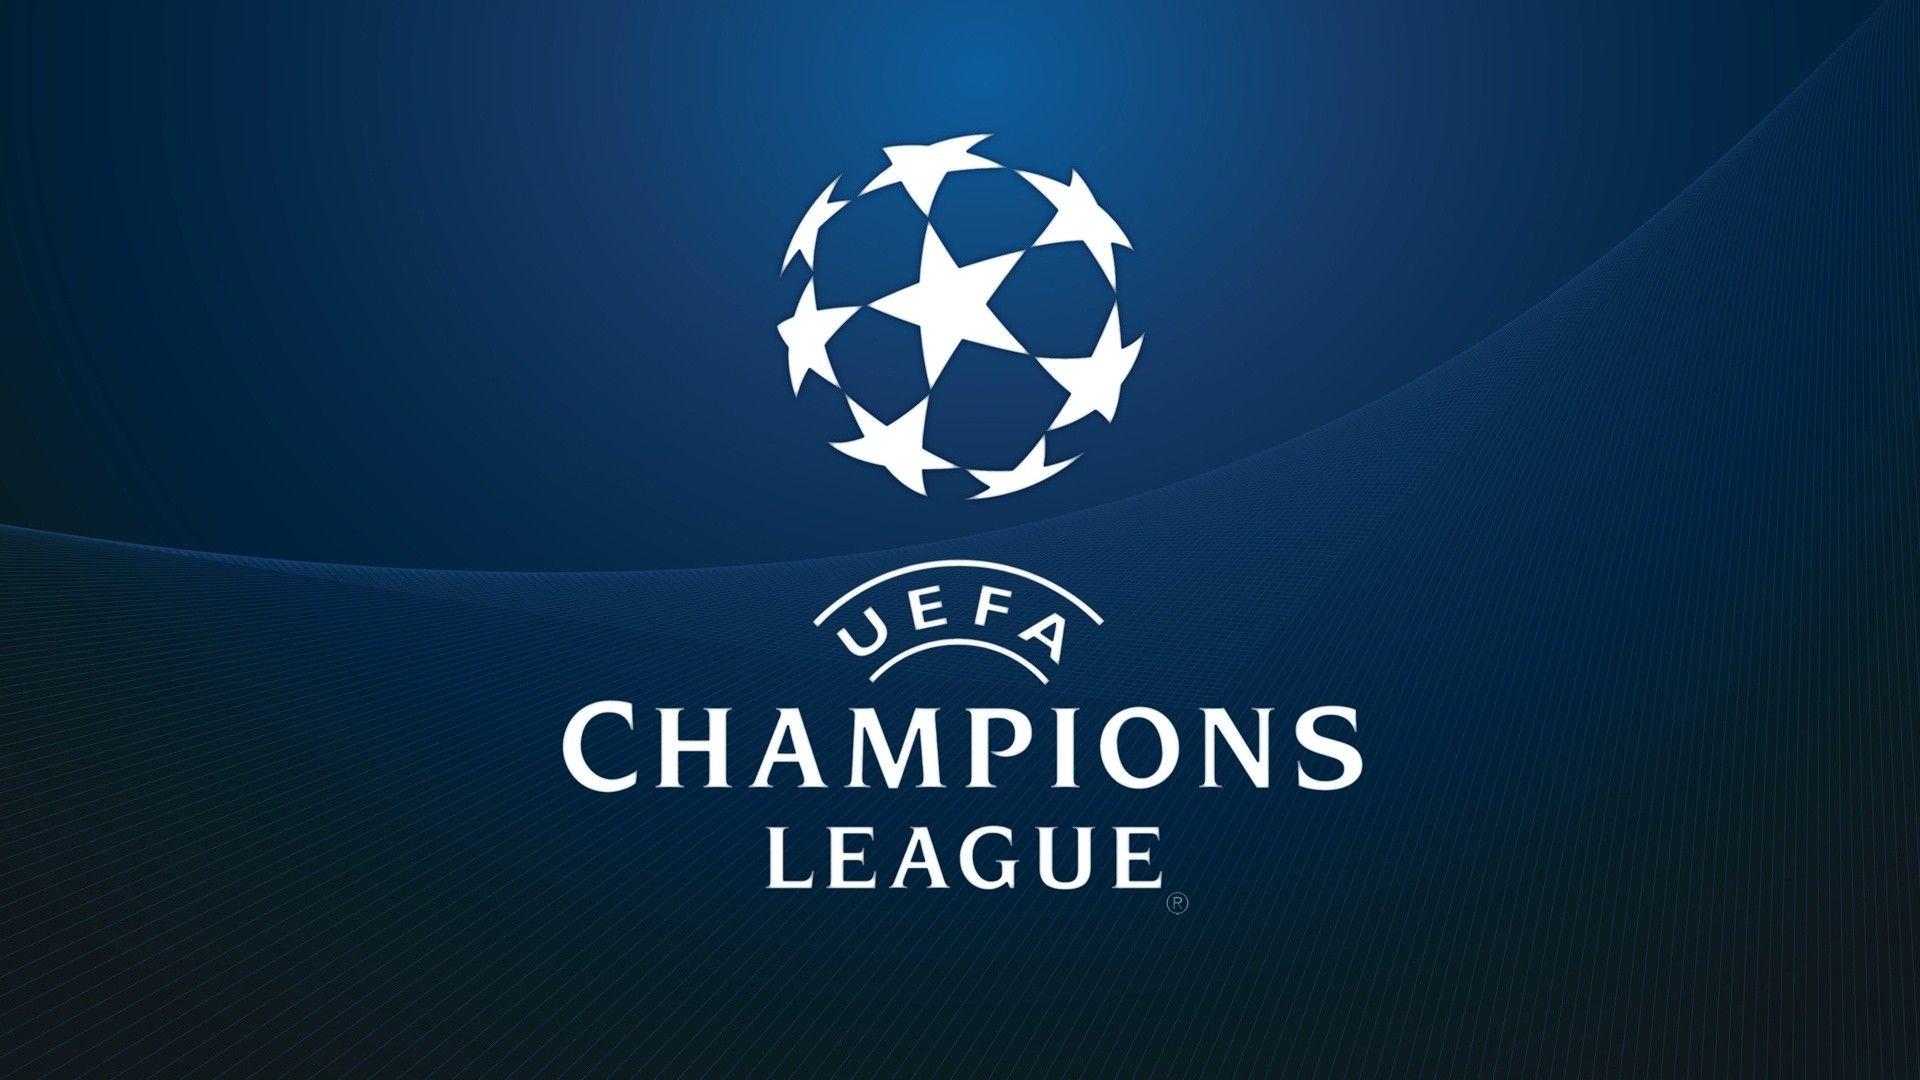 Uefa Champions League Logo Hd Wallpaper Hd Wallpaper Of Champions Uefa Champions La Champions League